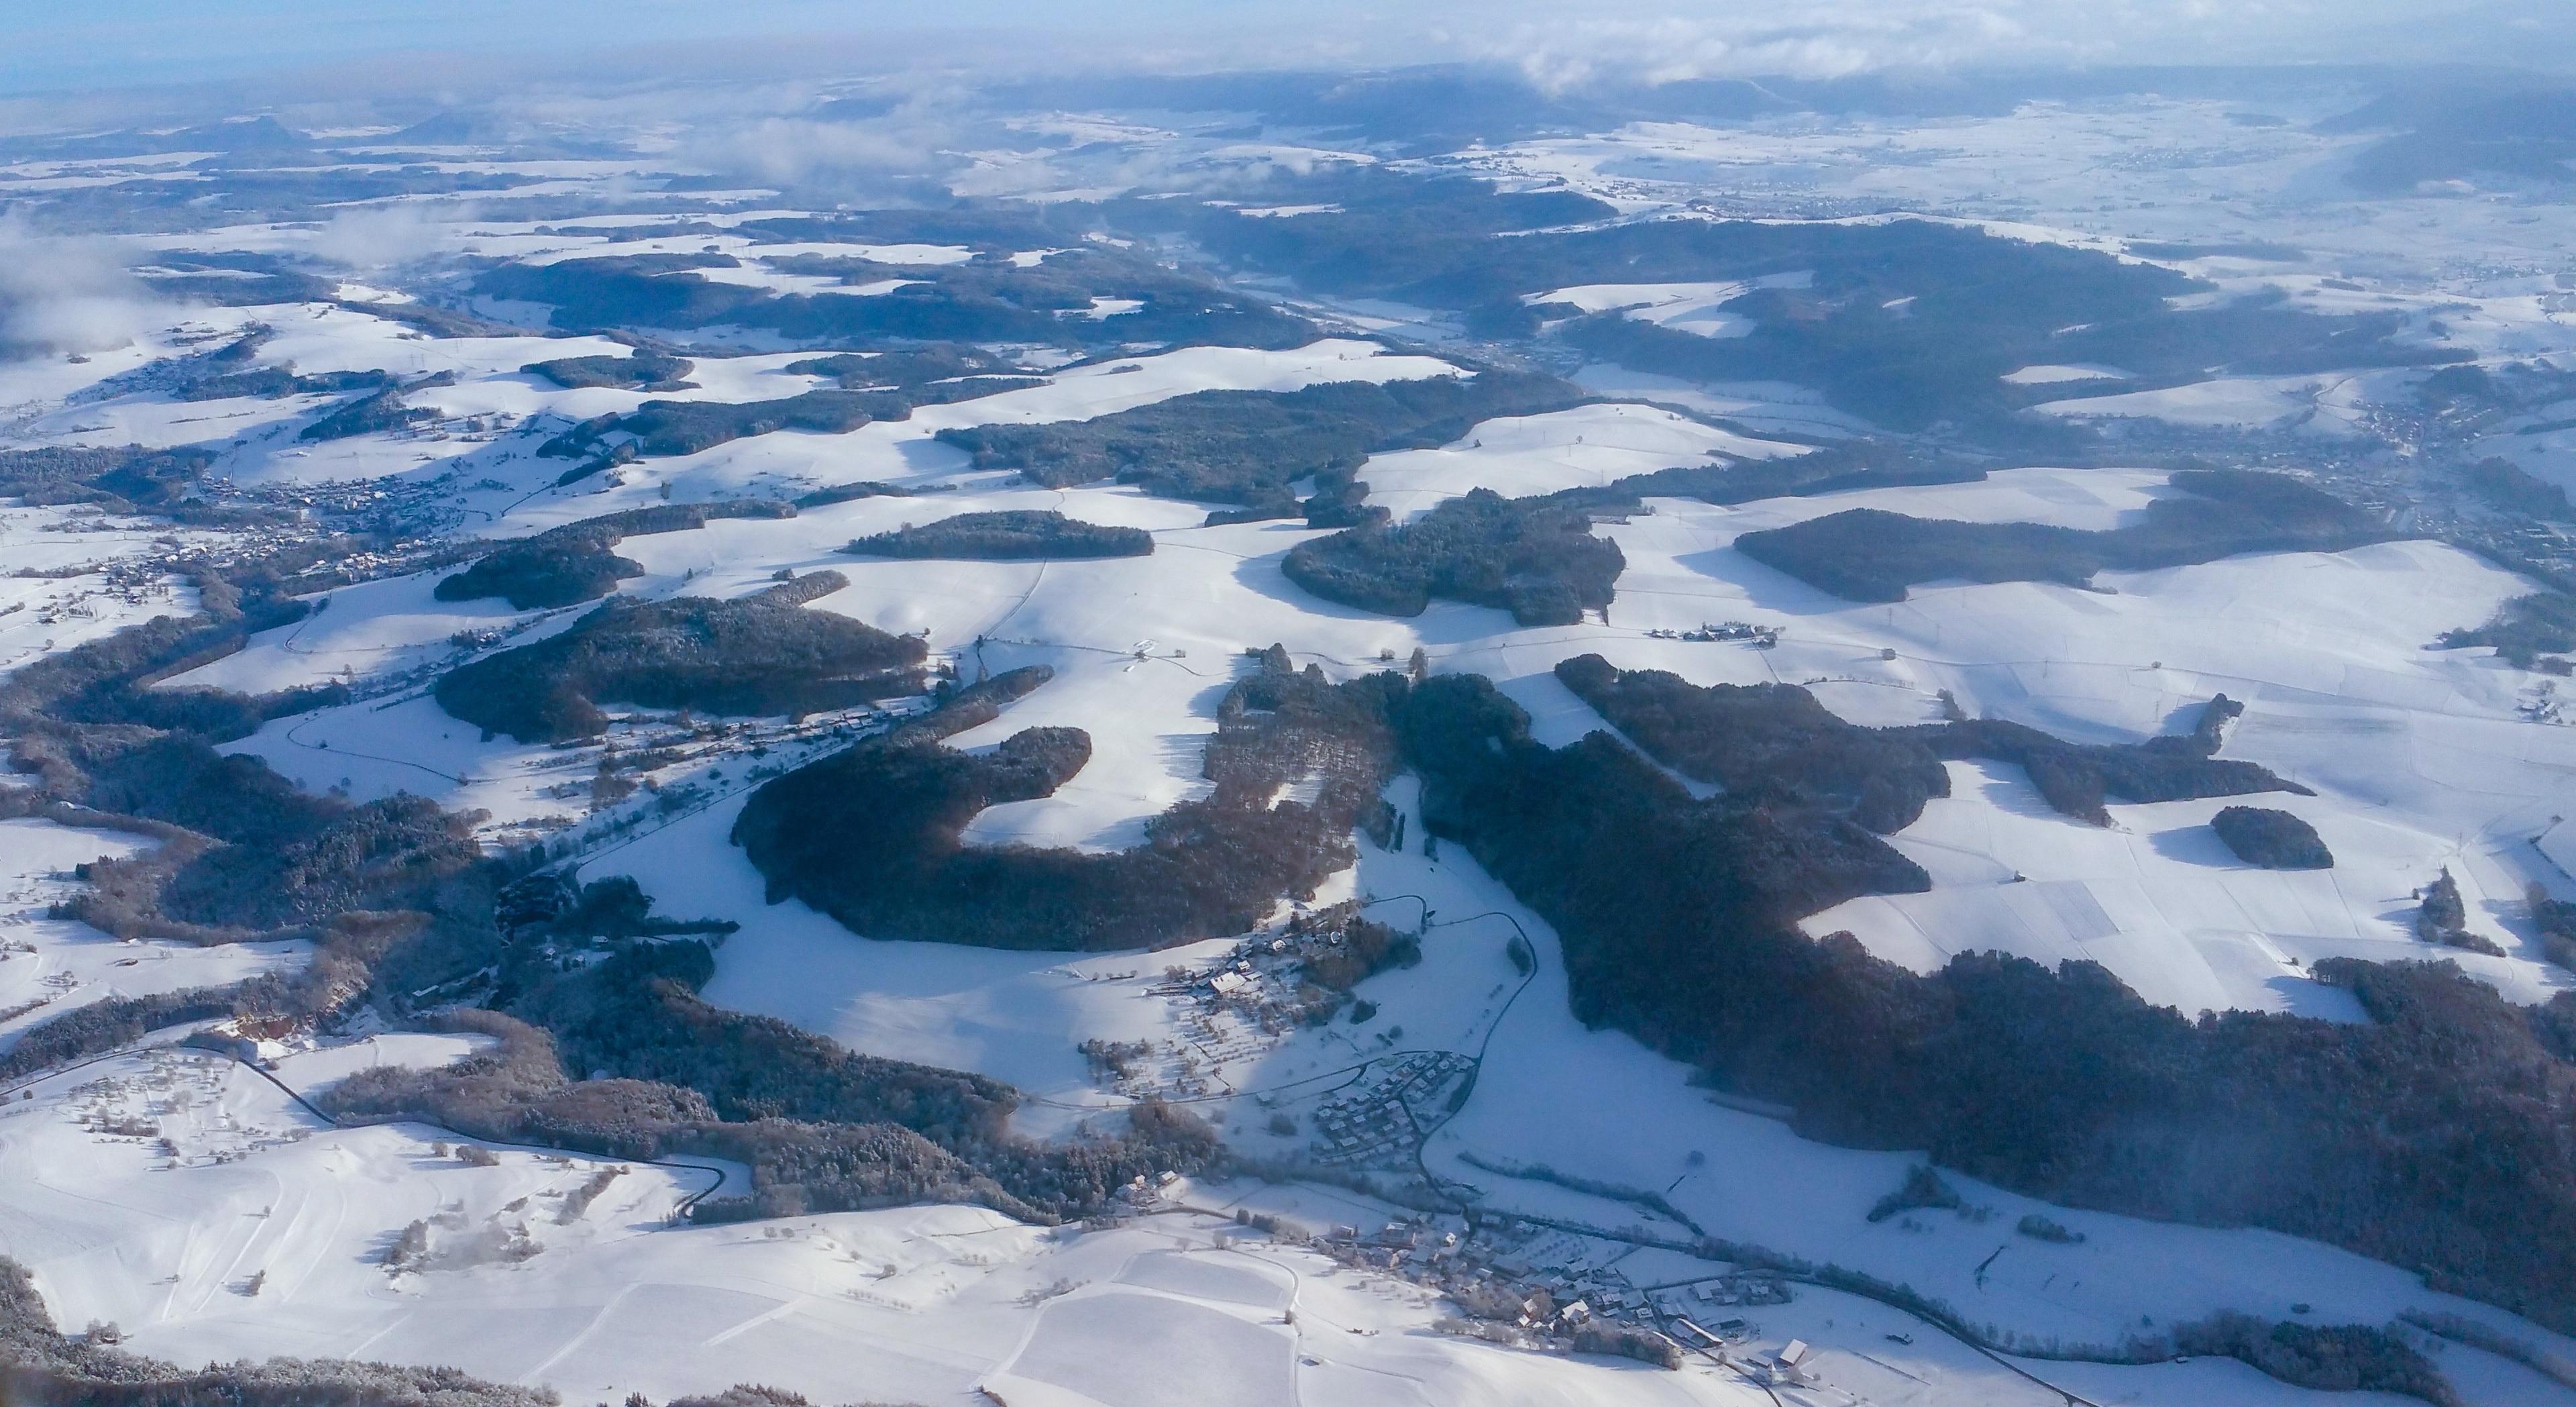 Waldshut-Tiengen, Baden-Württemberg, Germany